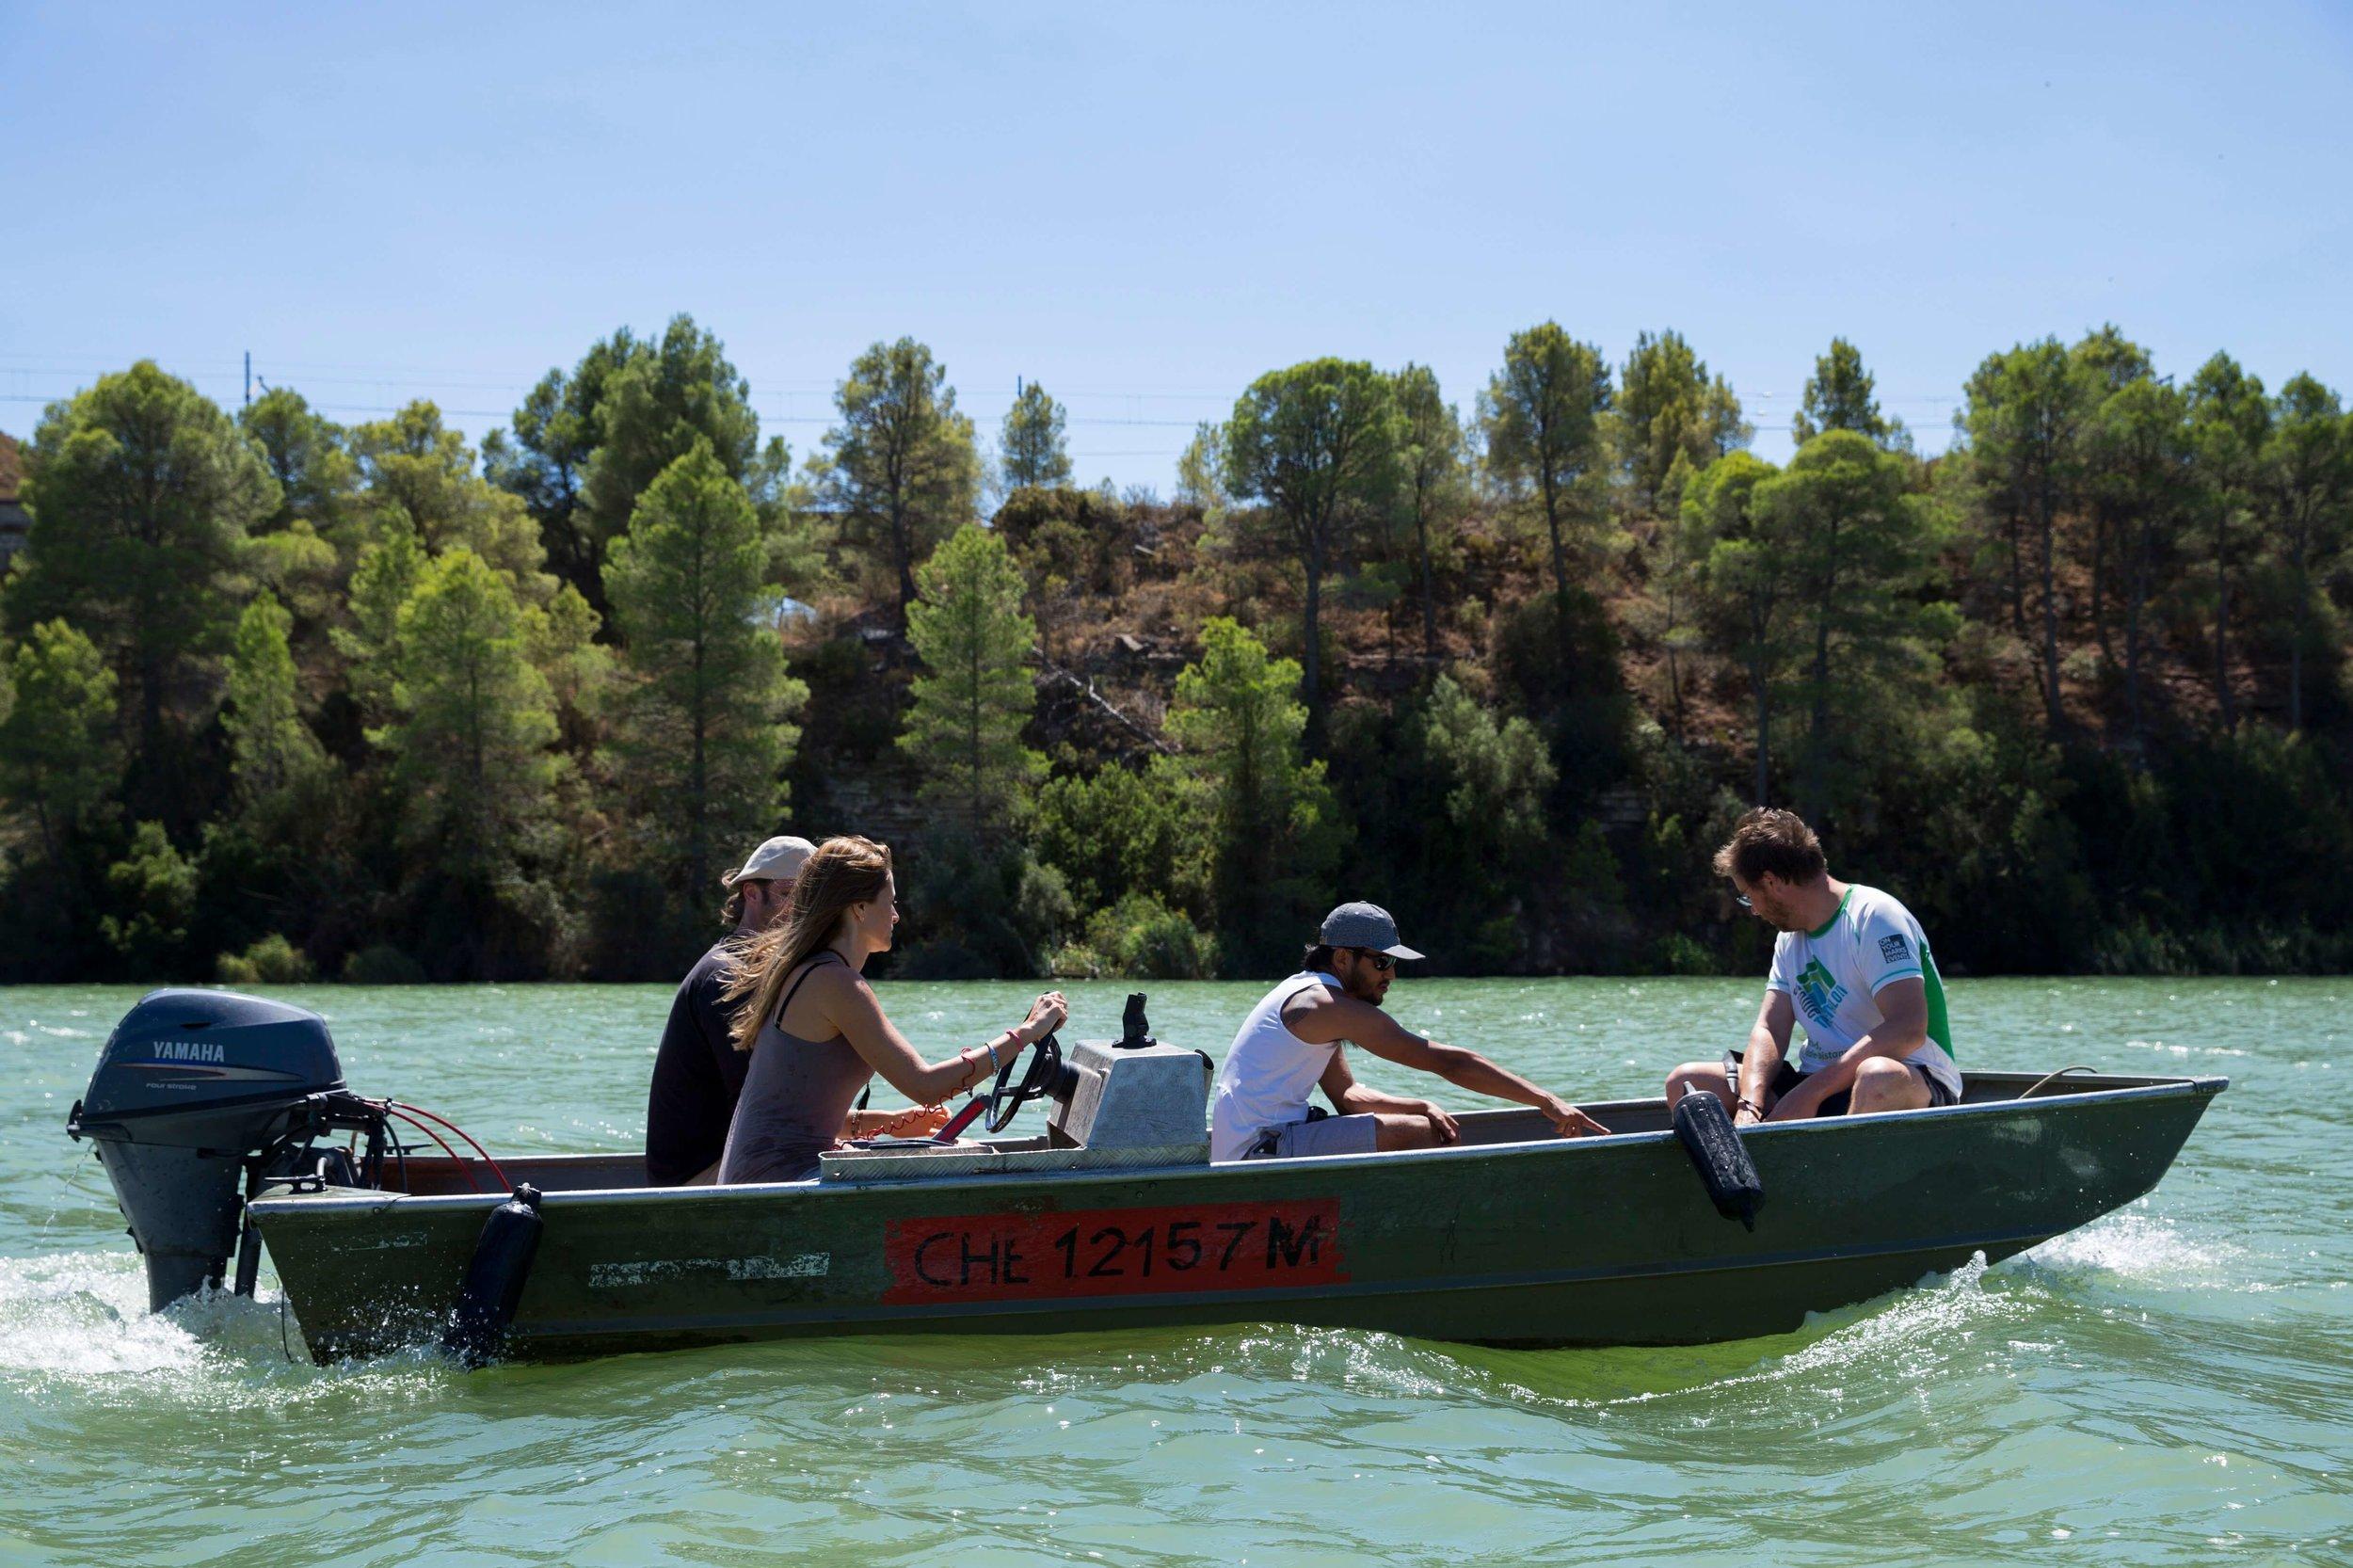 boat to matarraña afarirural coliving s